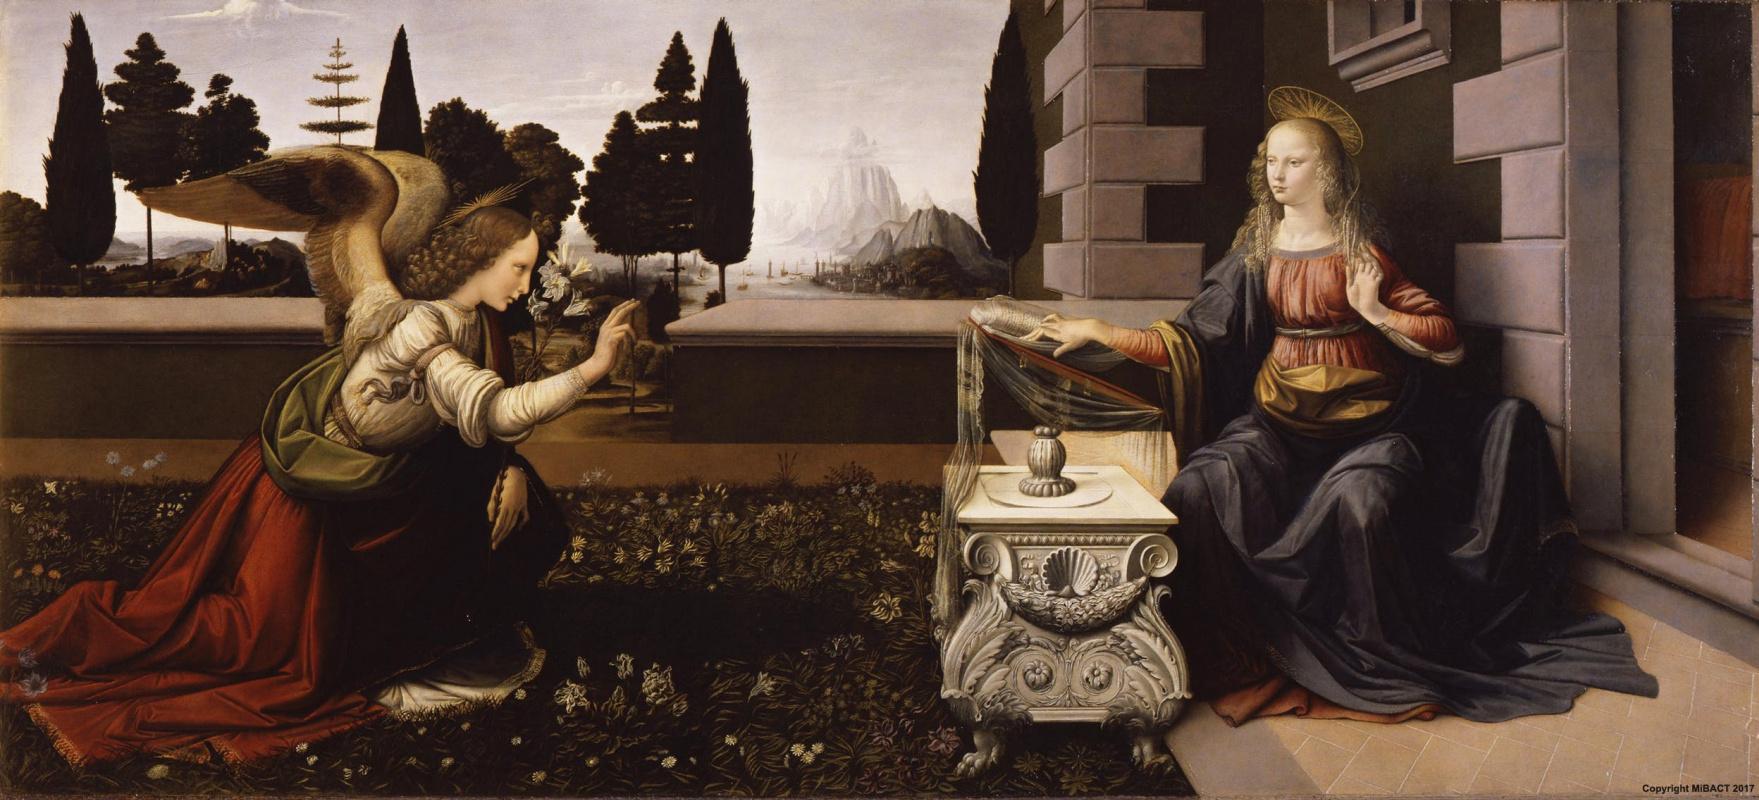 Leonardo da Vinci. The Annunciation